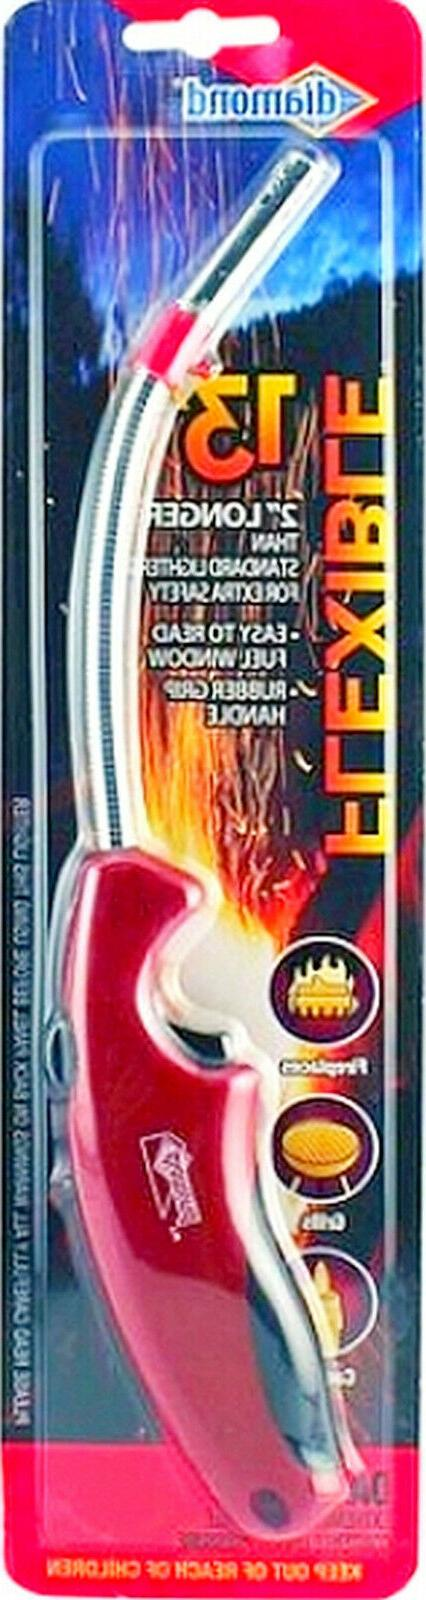 "RED fLeXibLe neck 13"" eXtra LONG LIGHTER Butane fireplace gr"